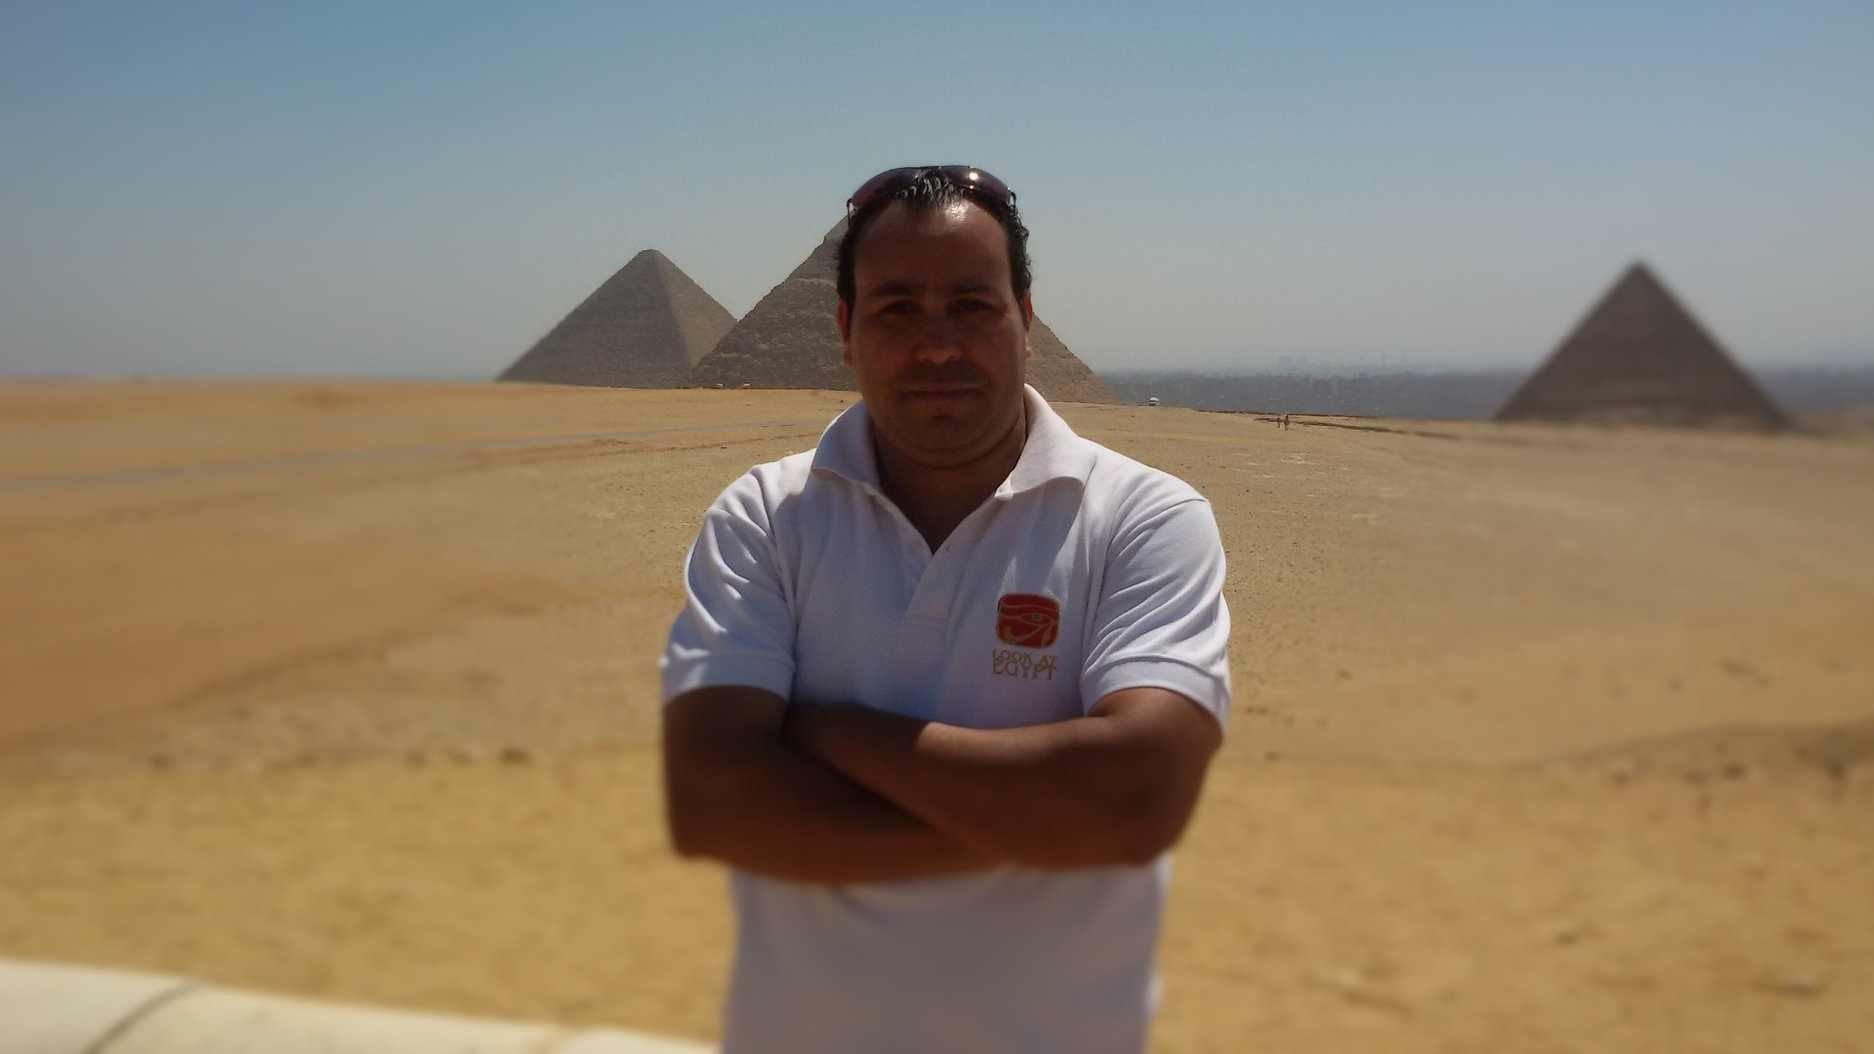 Ahmed Abdalfattah